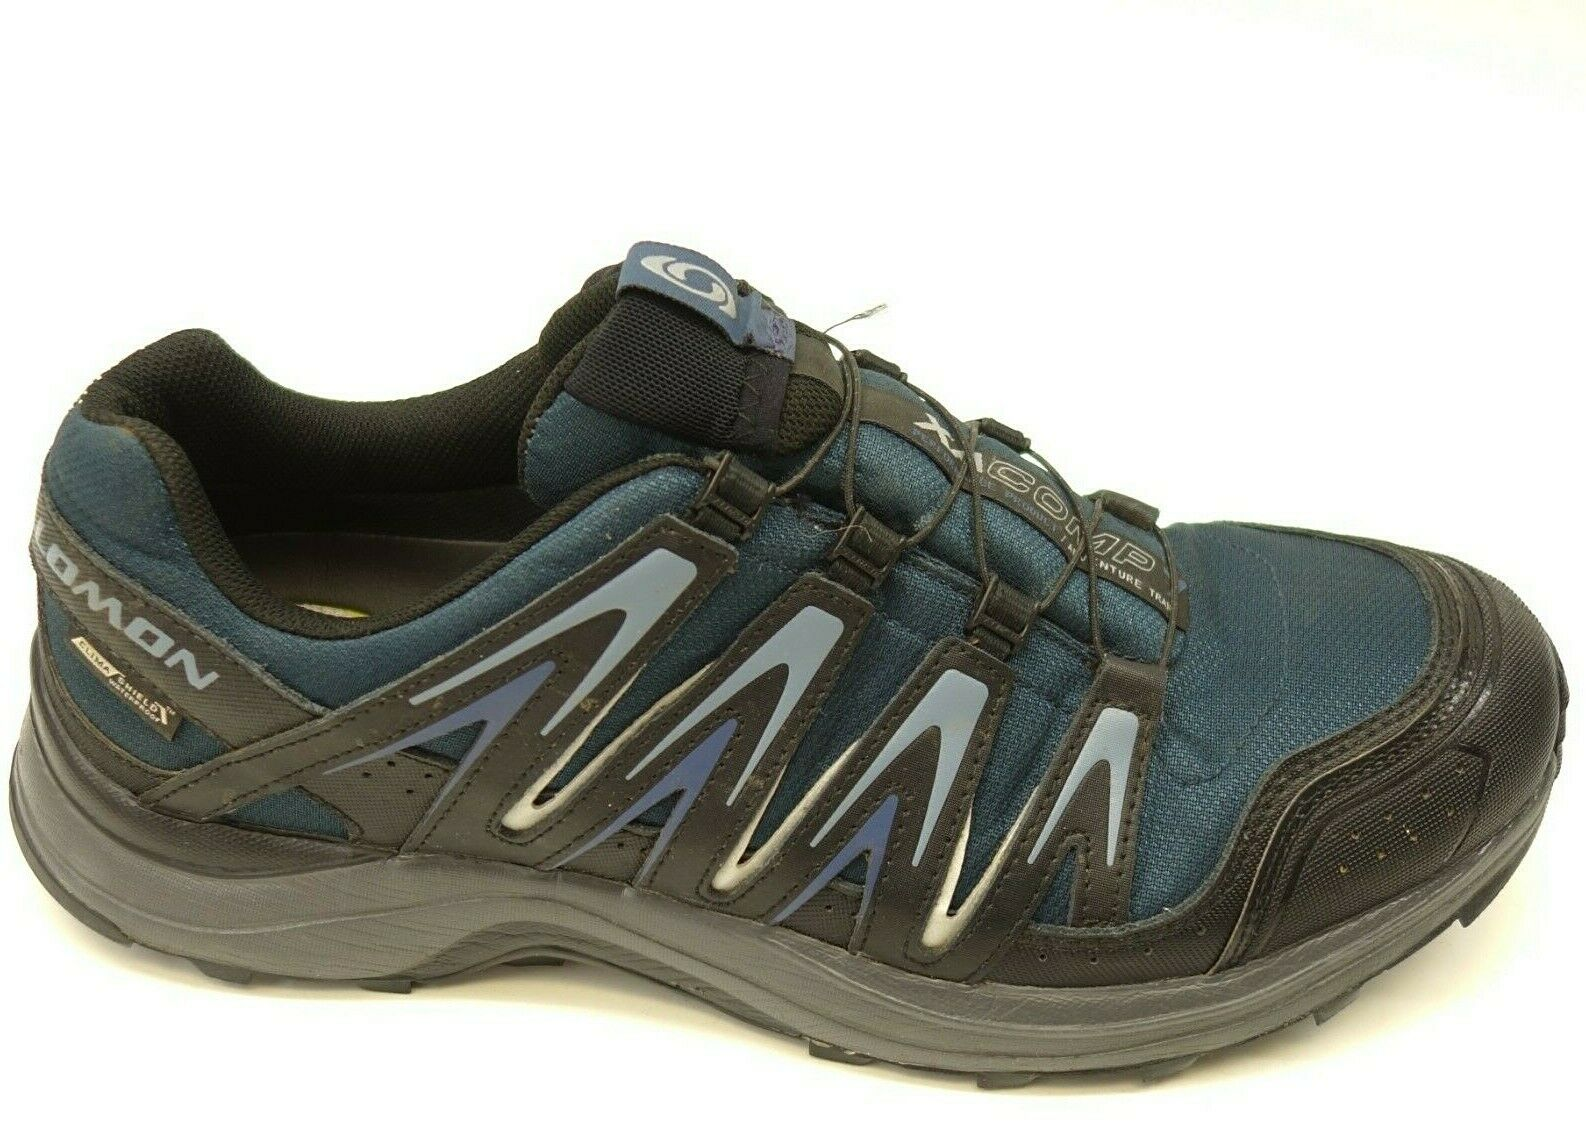 Salomon XA Comp 7 CS WP Size US 13 Outdoor Hiking Trail Running Mens shoes